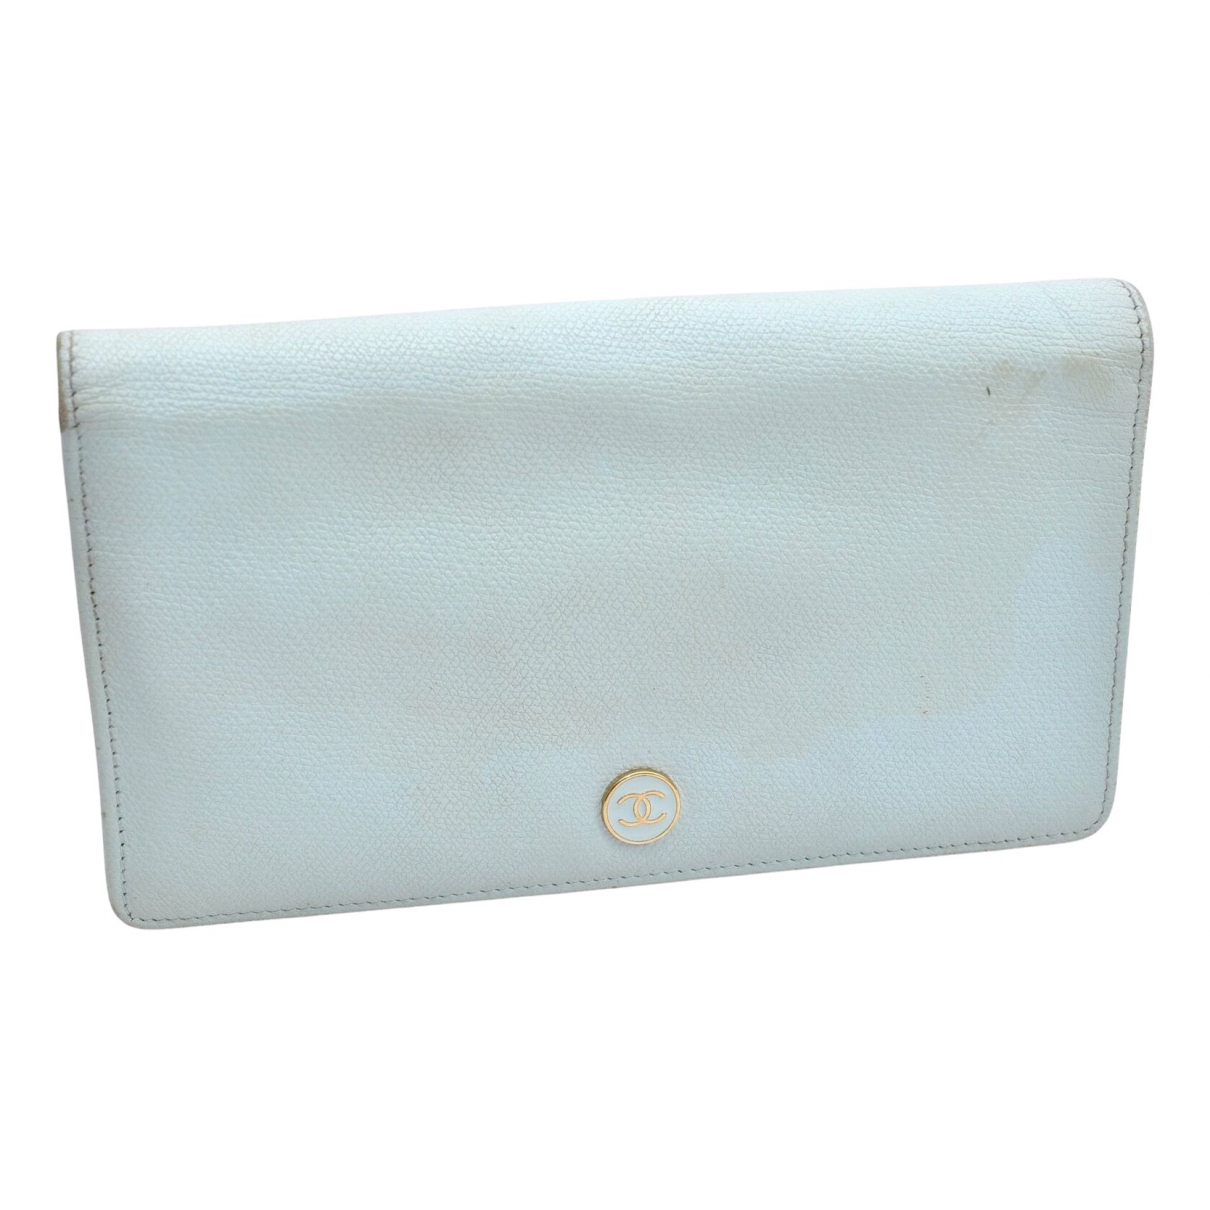 Chanel \N Portemonnaie in  Blau Leder